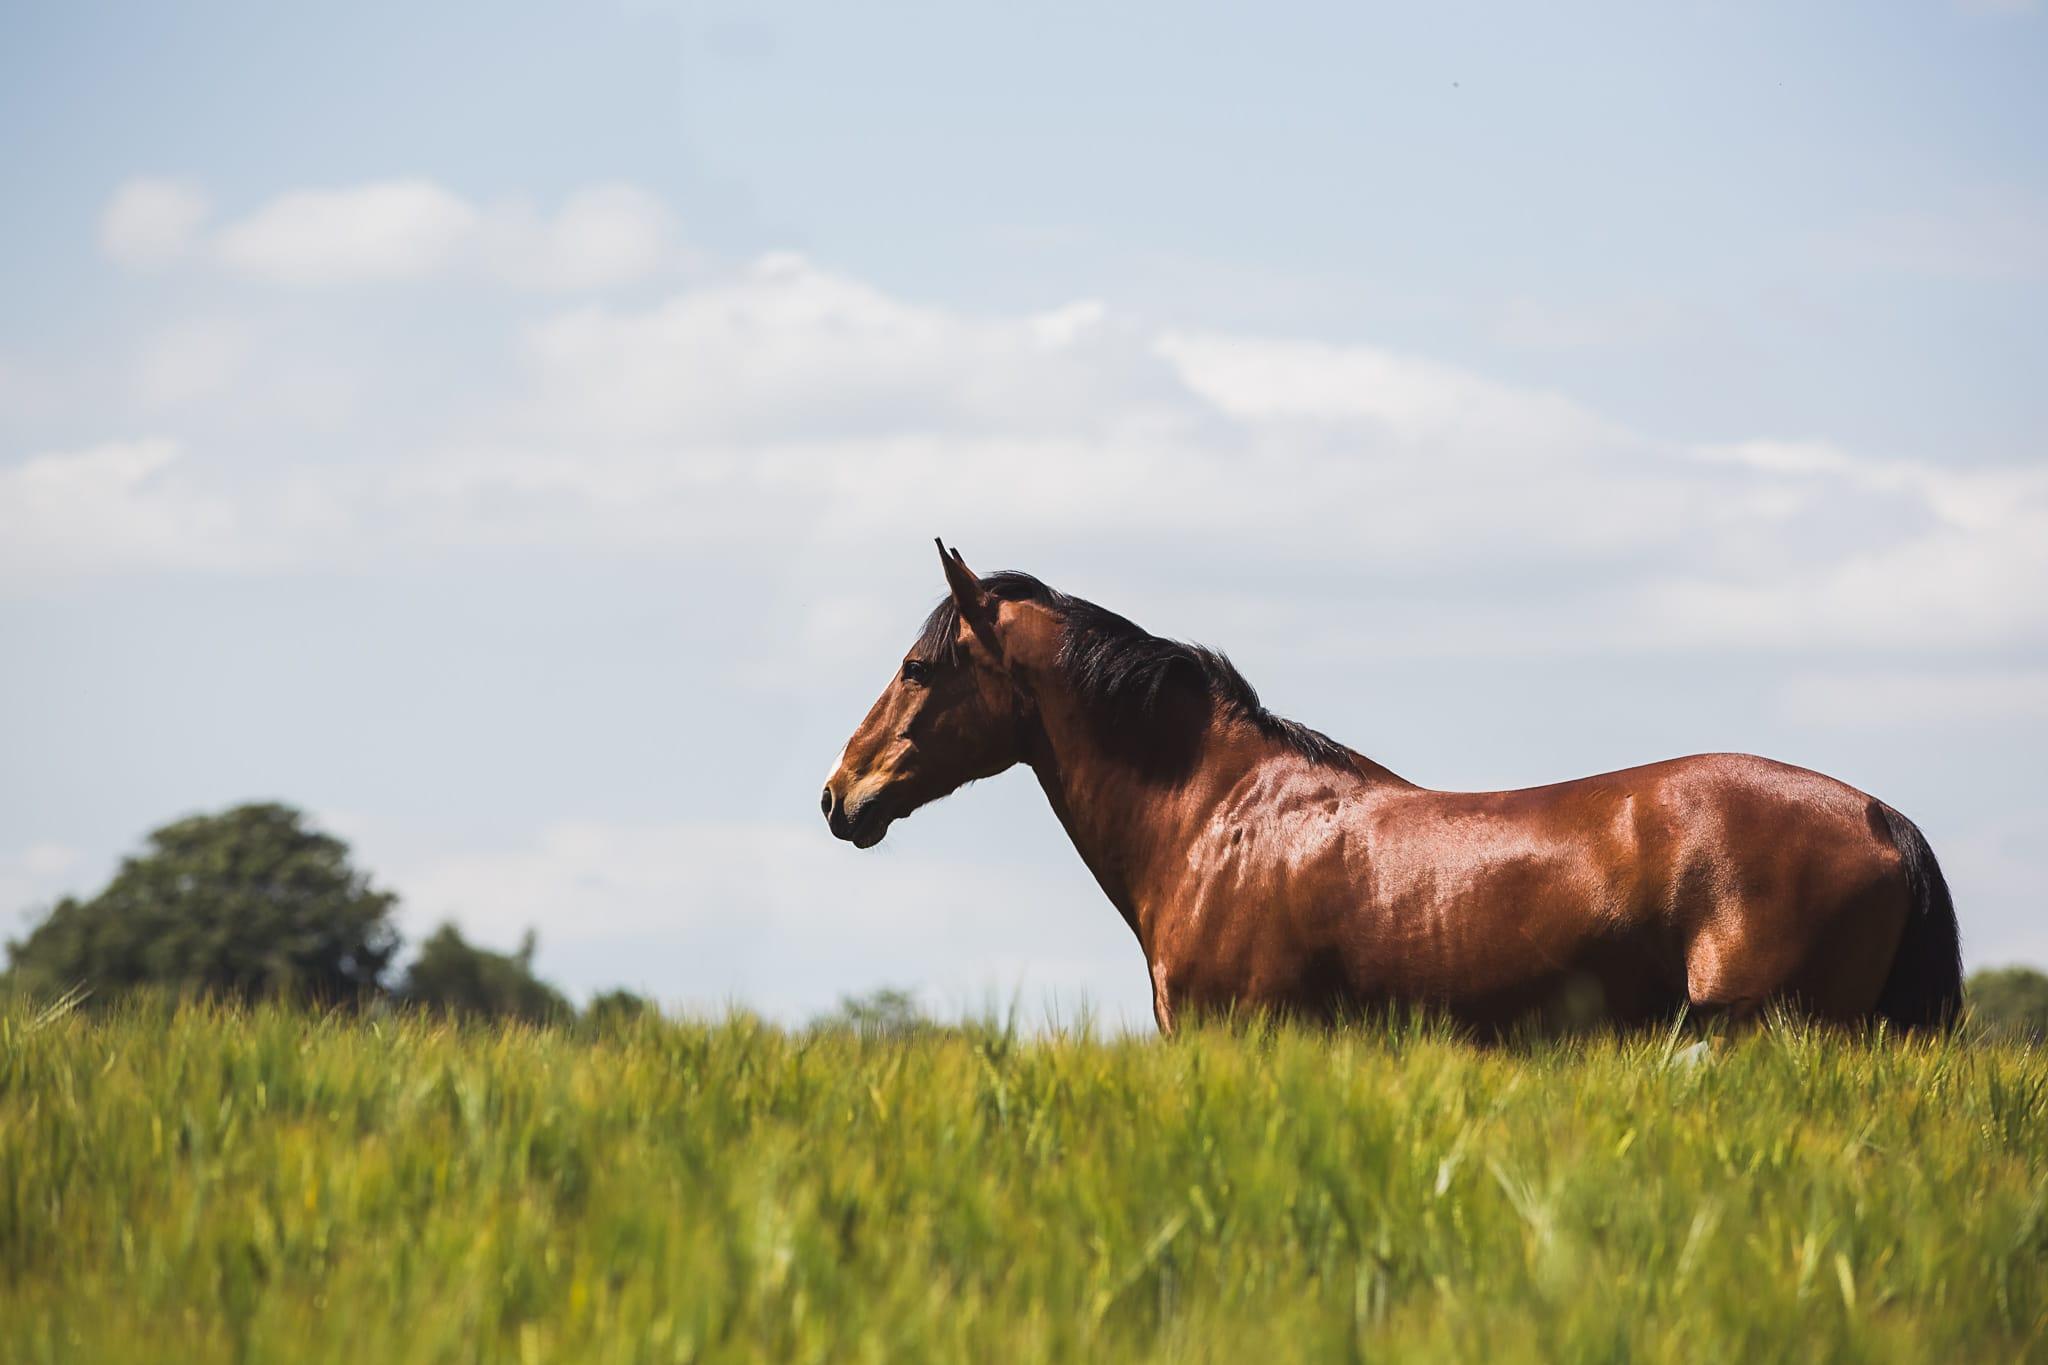 equine portrait spring summer horse equestrian hampshire wiltshire